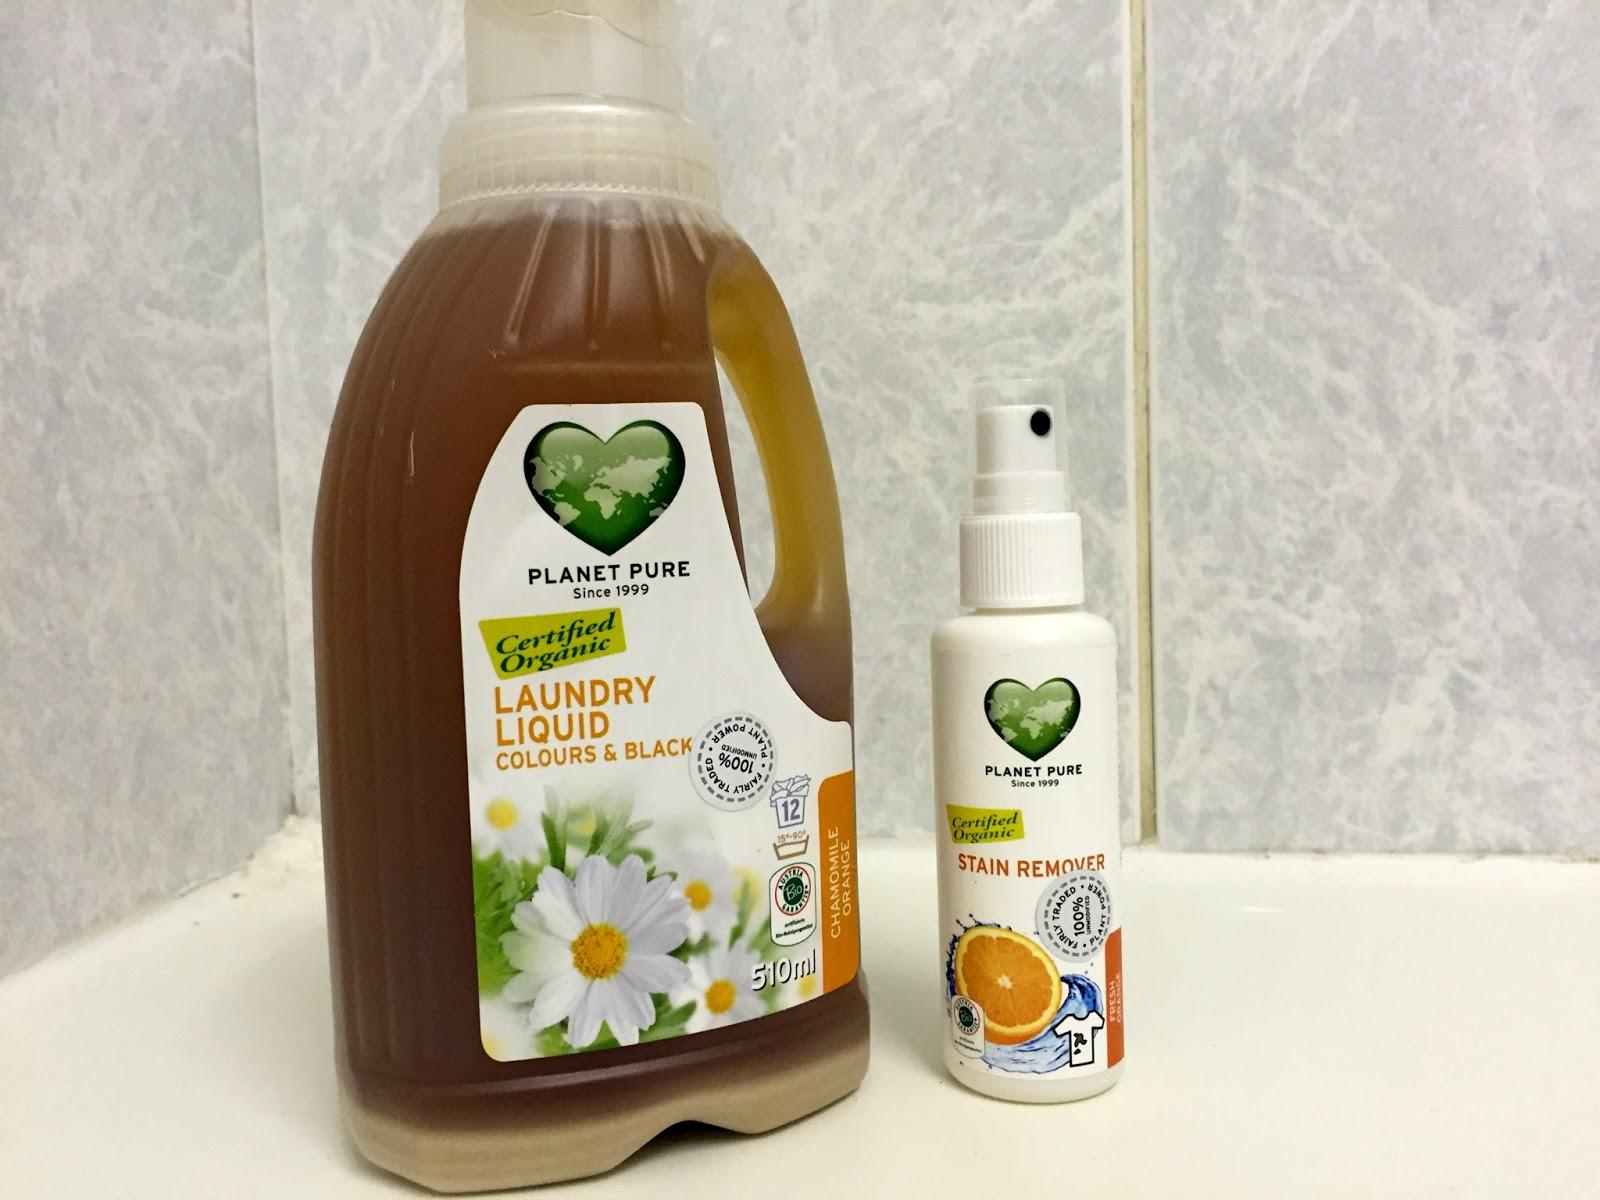 Planet Pure Organic Laundry Liquid